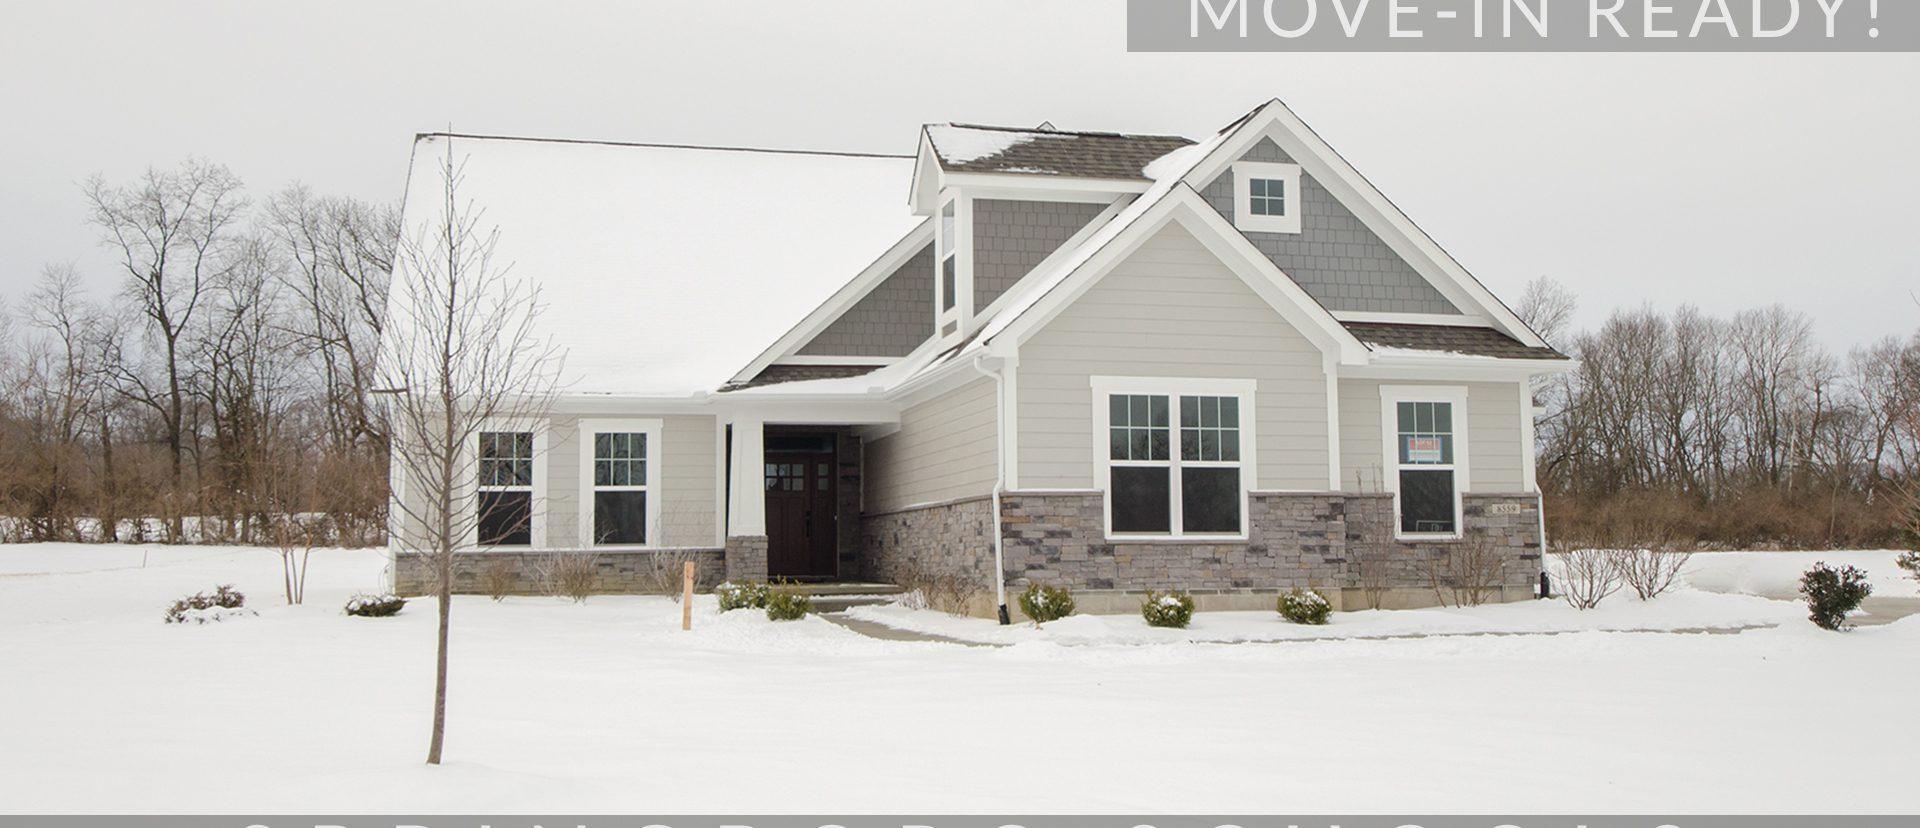 Cypress Ridge | The Jocelyn | Lot 52 - Design Homes